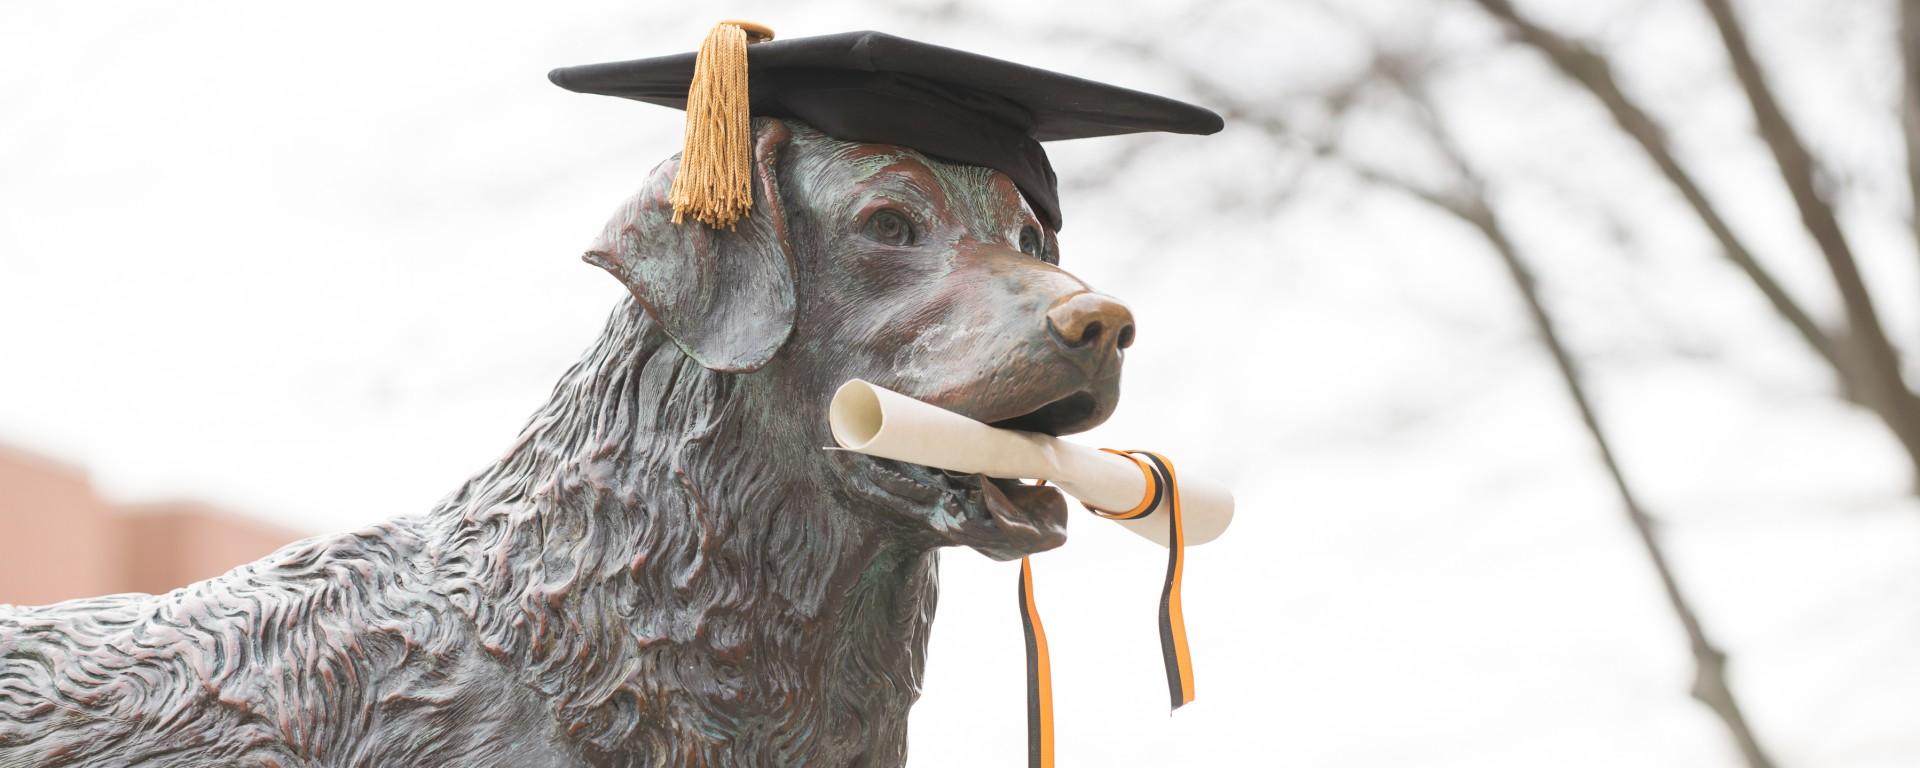 True Grit statue at December 2015 graduate commencement